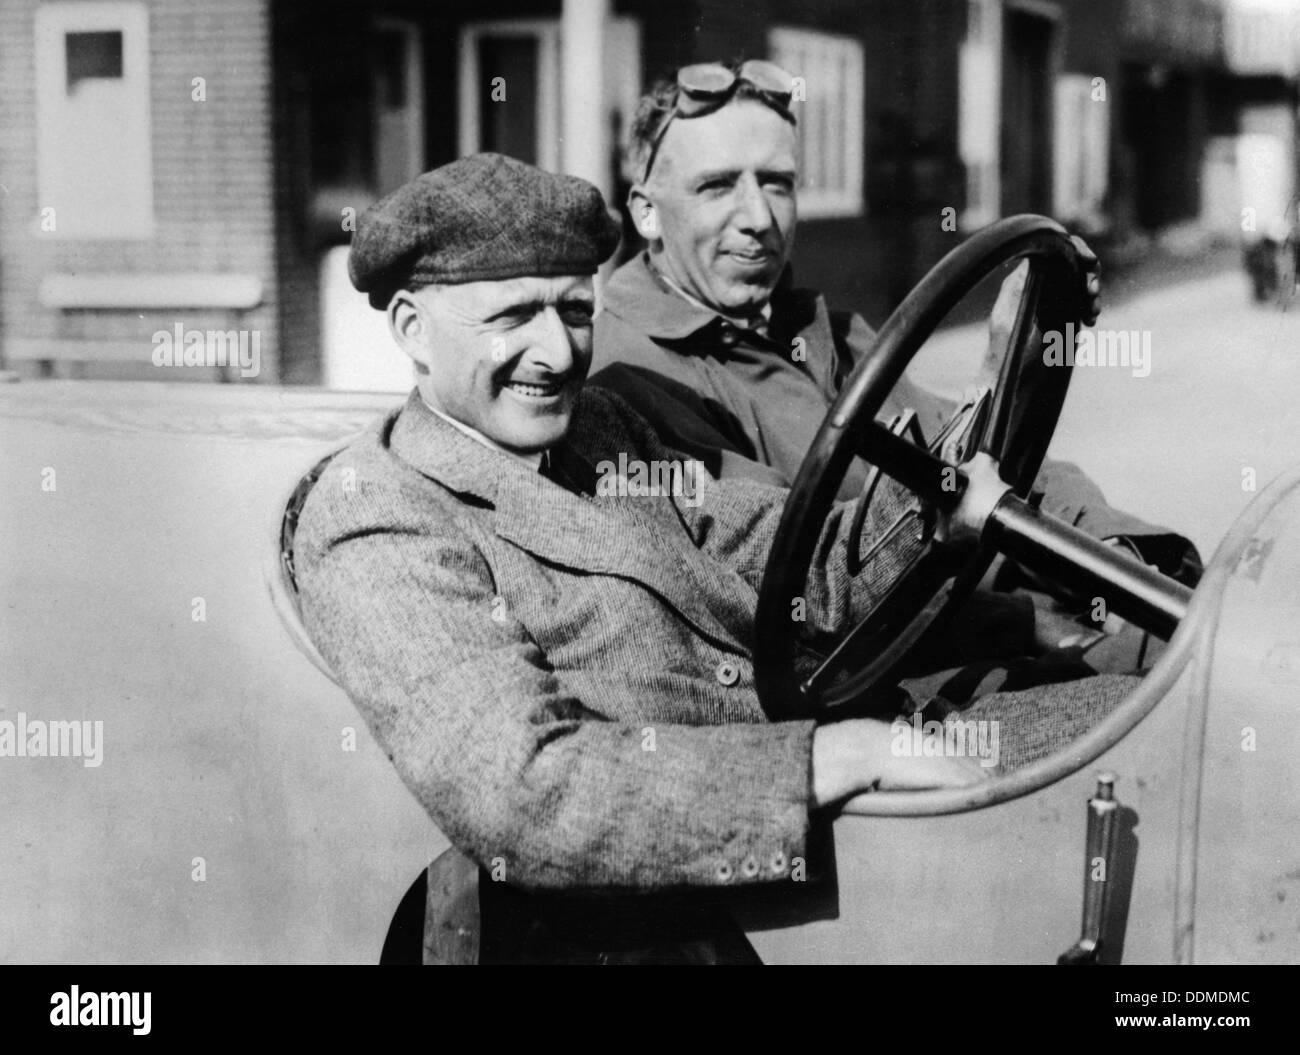 Zwei Männer in einem Oldtimer. Stockbild